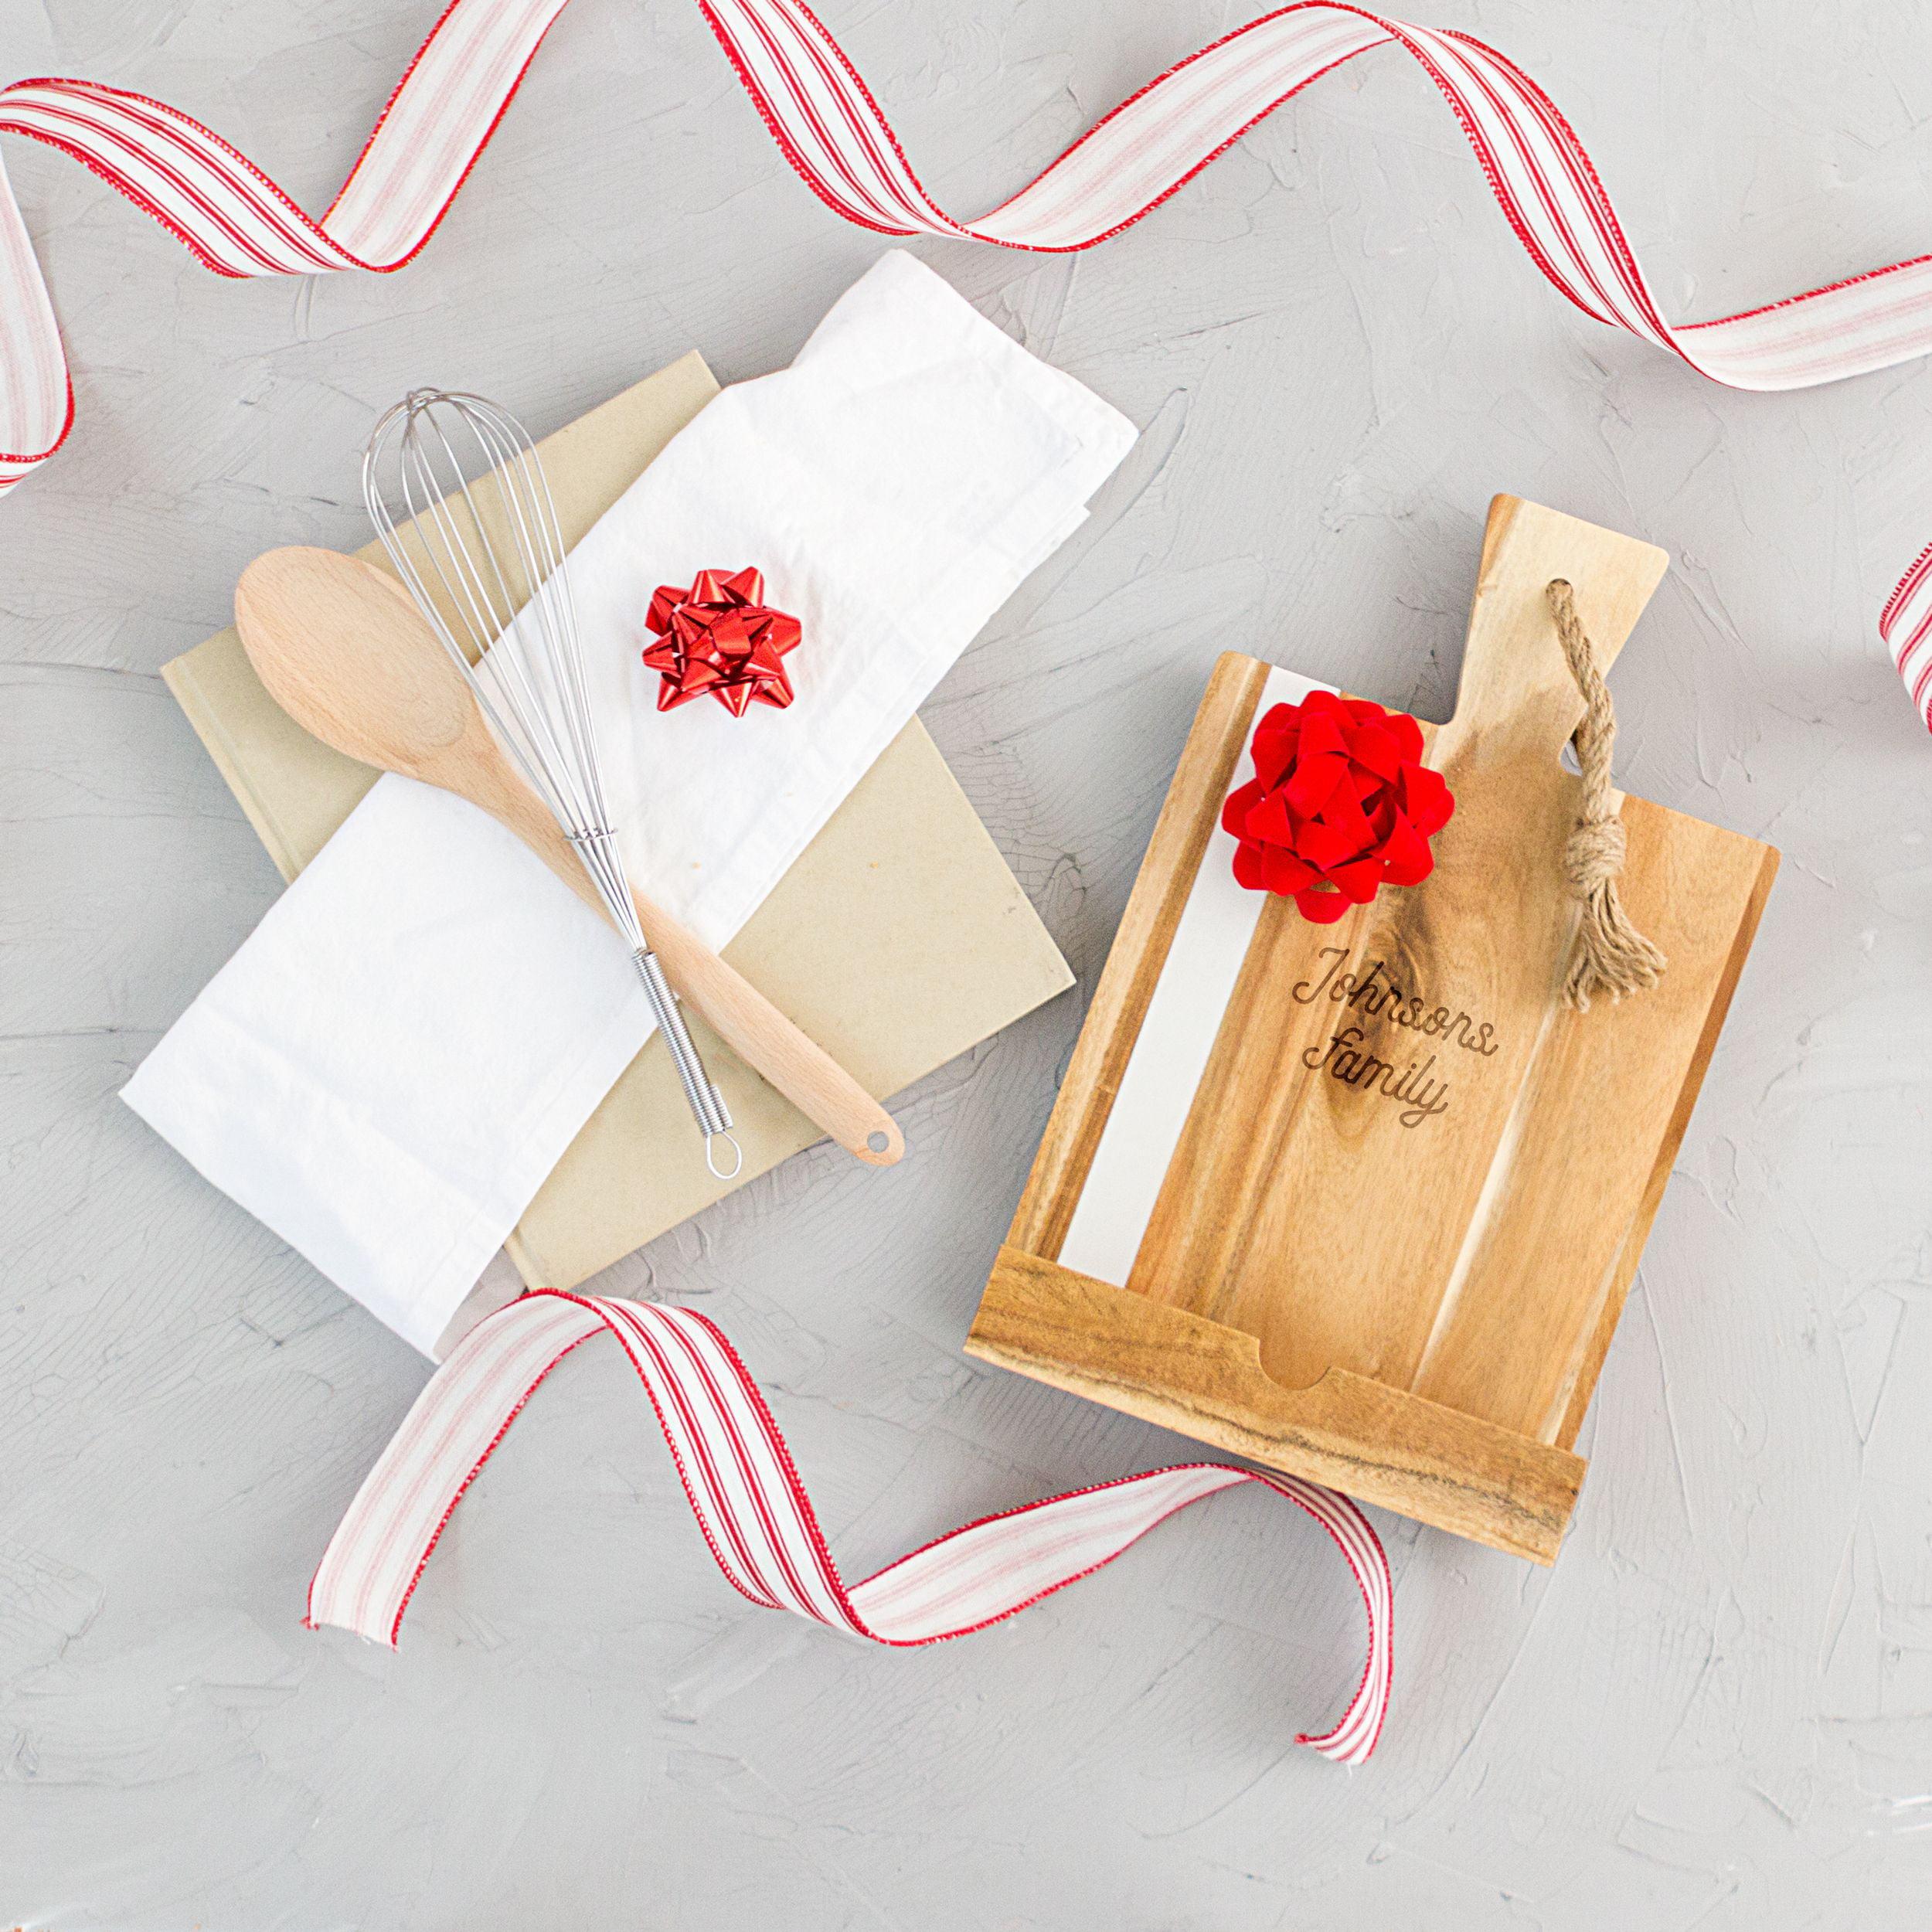 Personalized Gifts | Personalized Shop | Personalized | Walmart.com